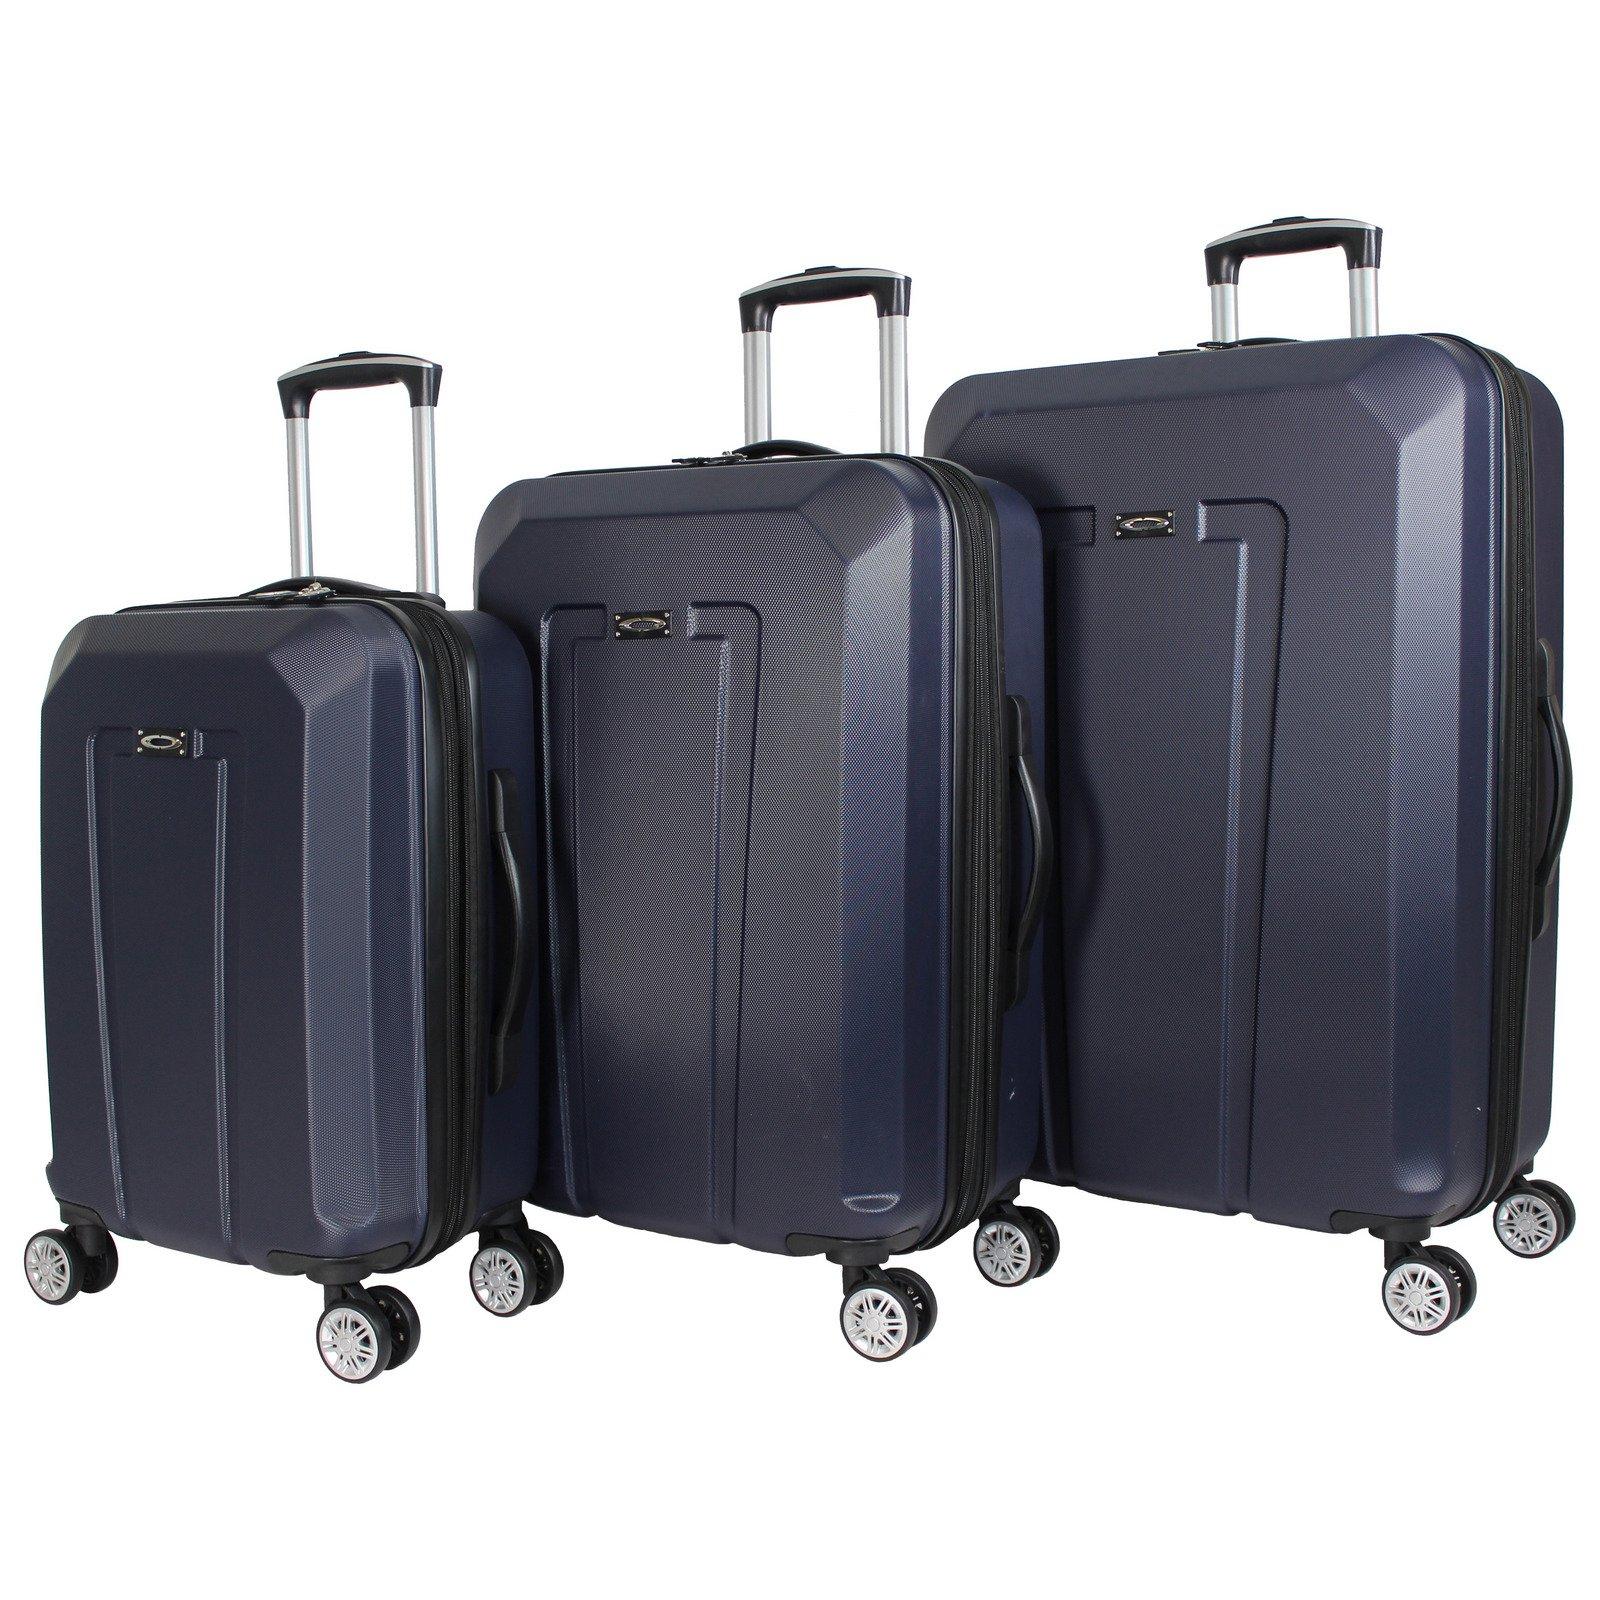 Kemyer 3-Piece Hardside Upright Spinner Rolling Luggage Set - Navy